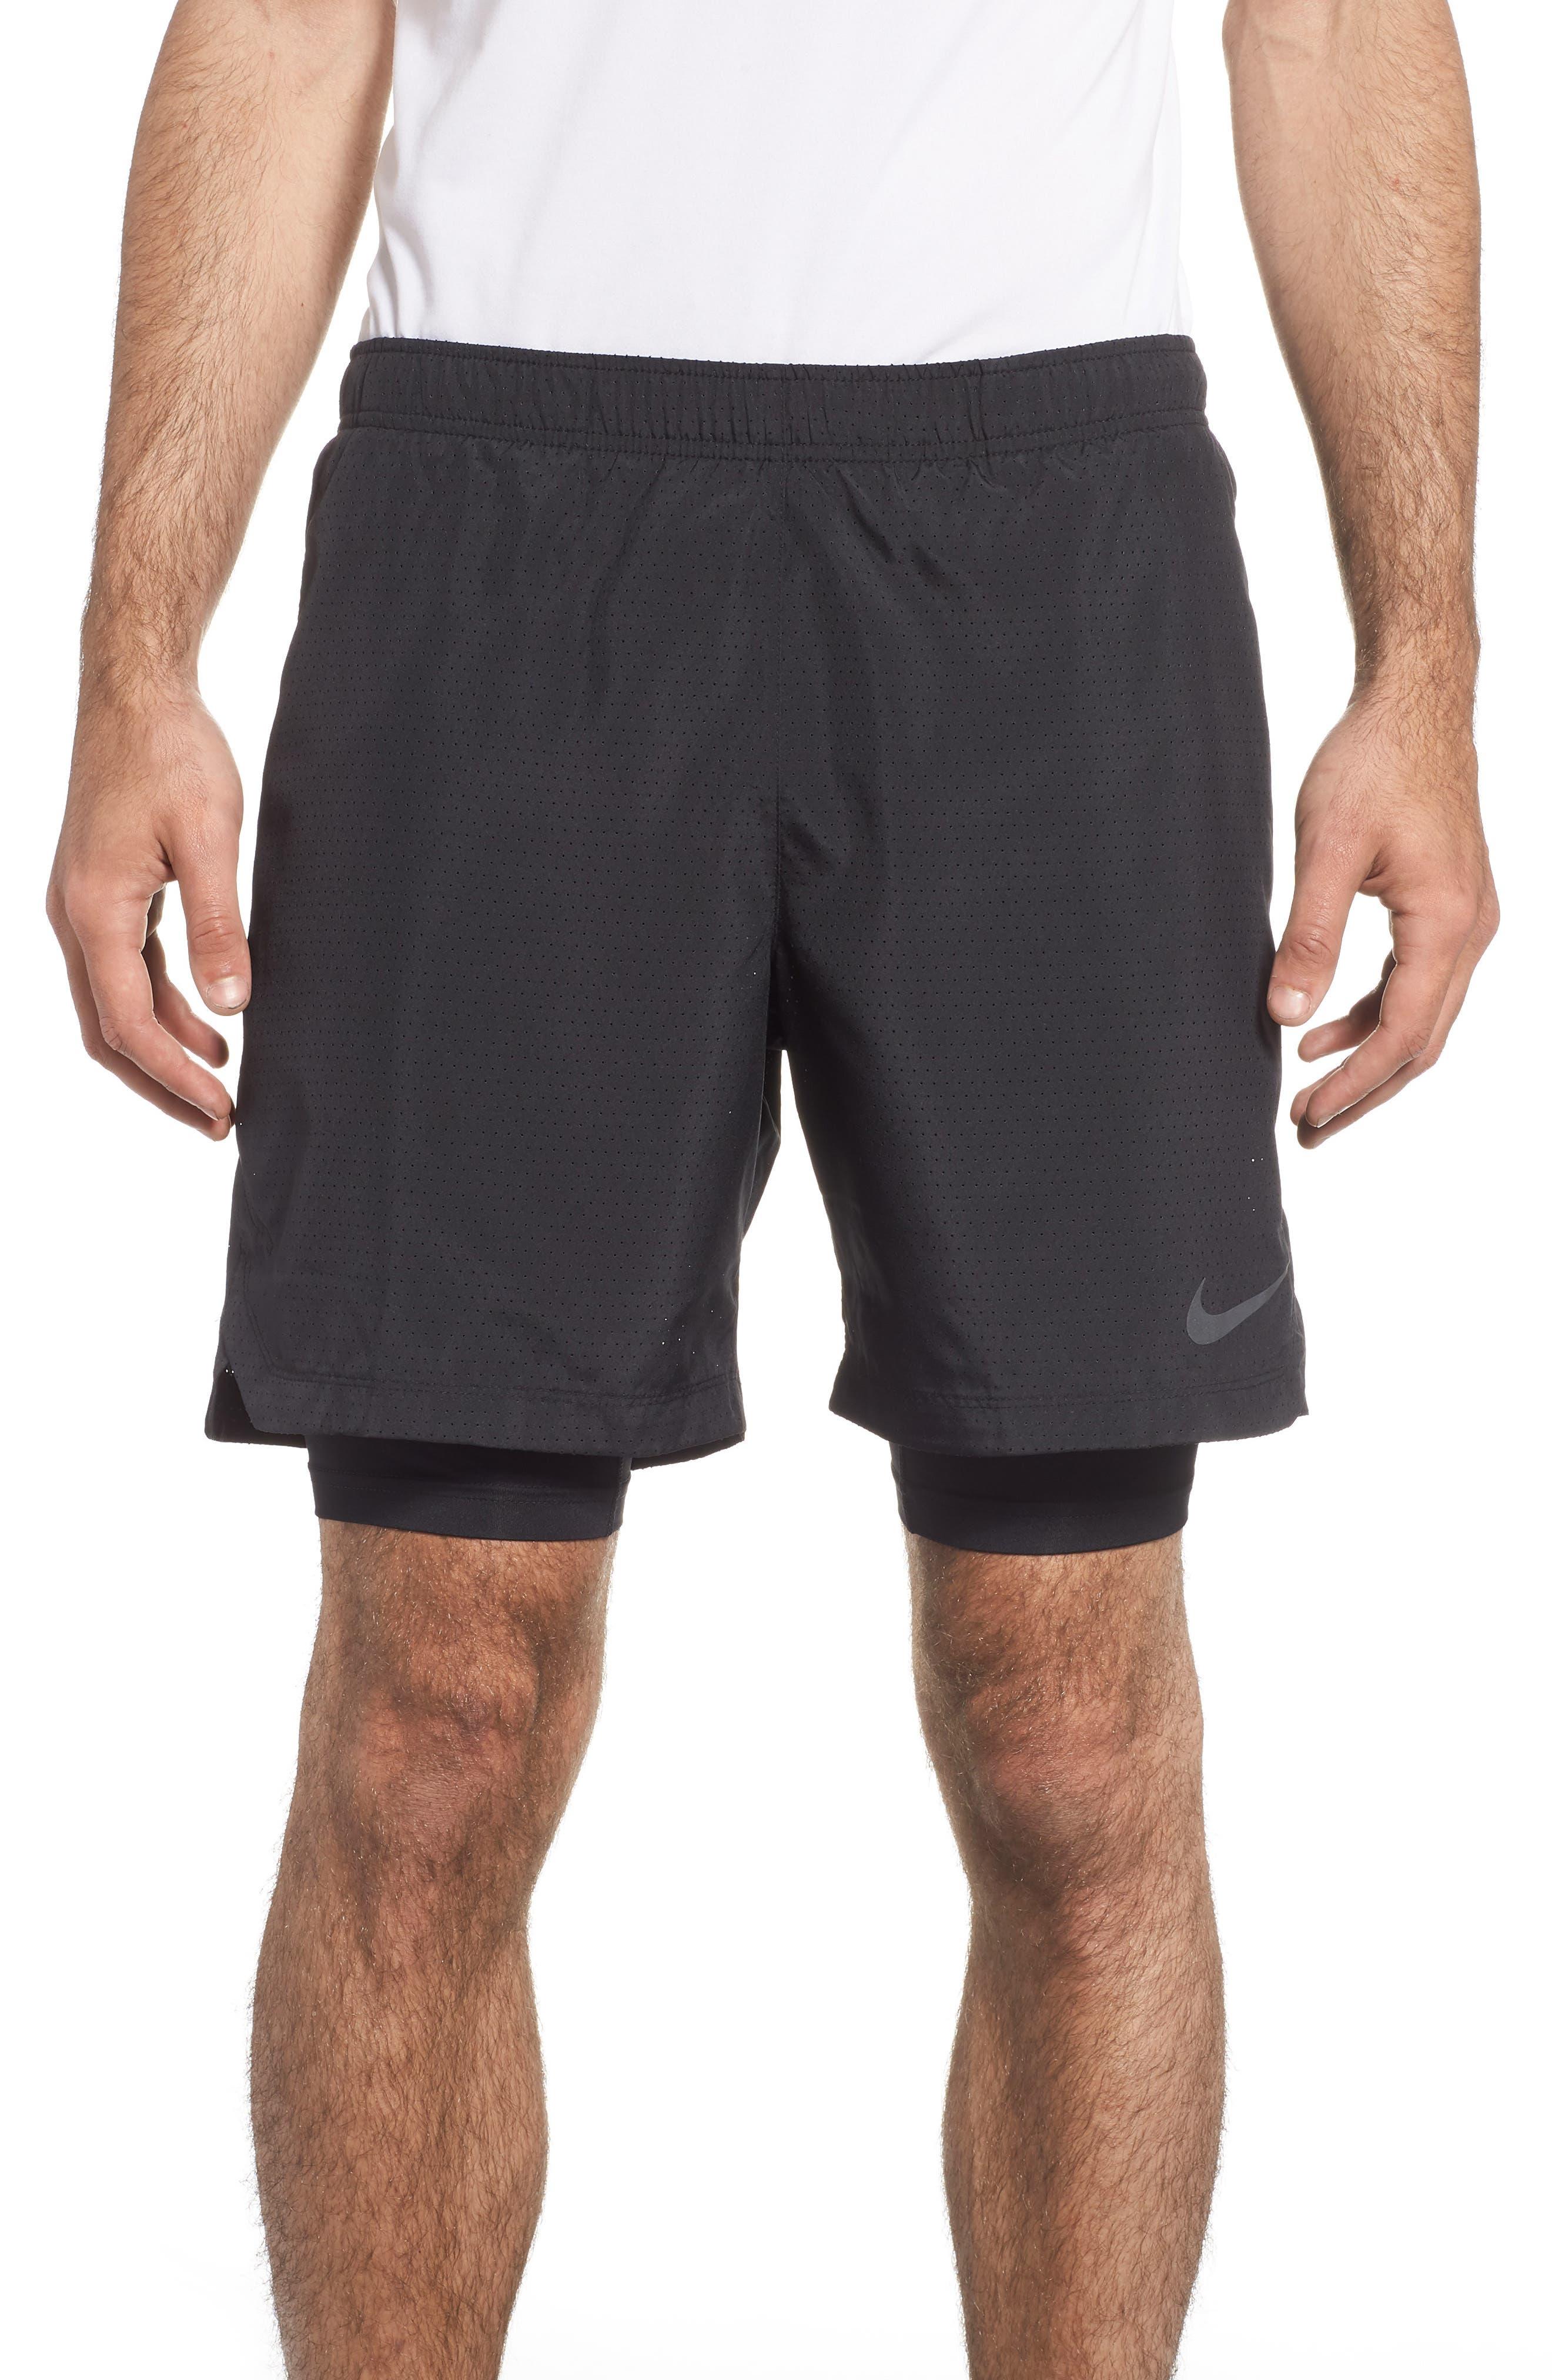 Nike Running Challenger 2-In-1 Shorts